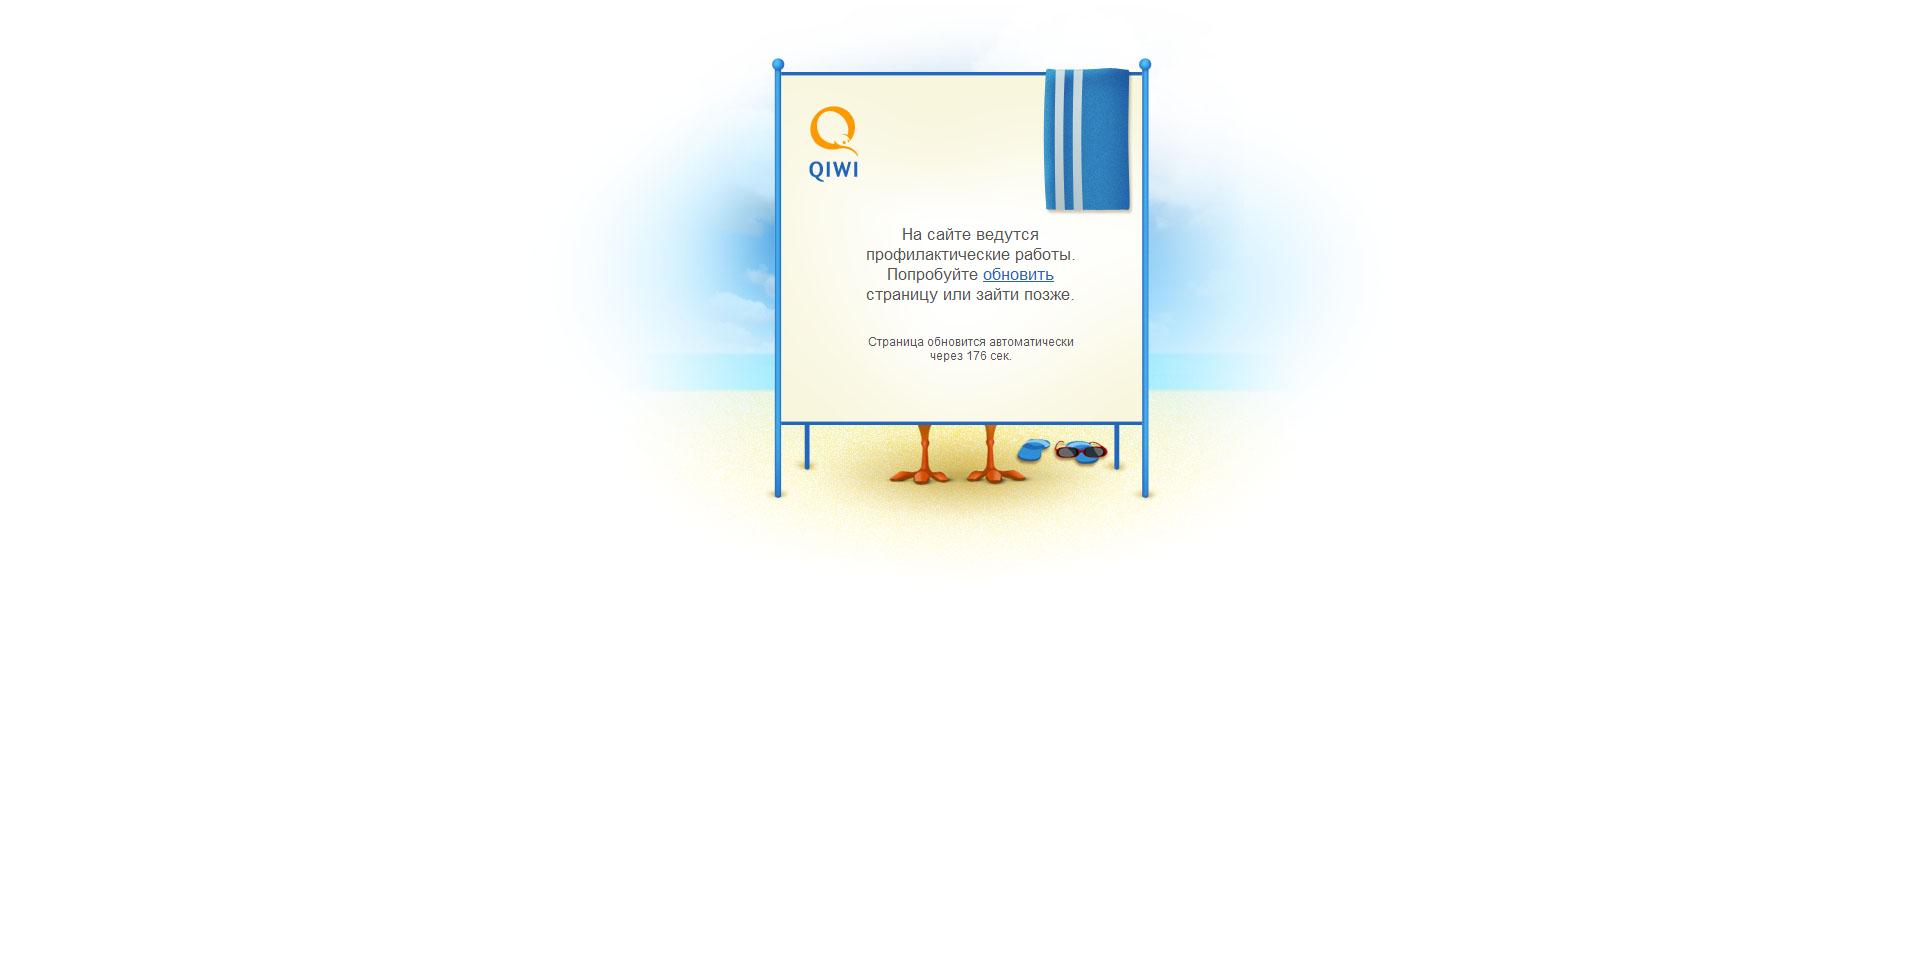 Курс валют qiwi